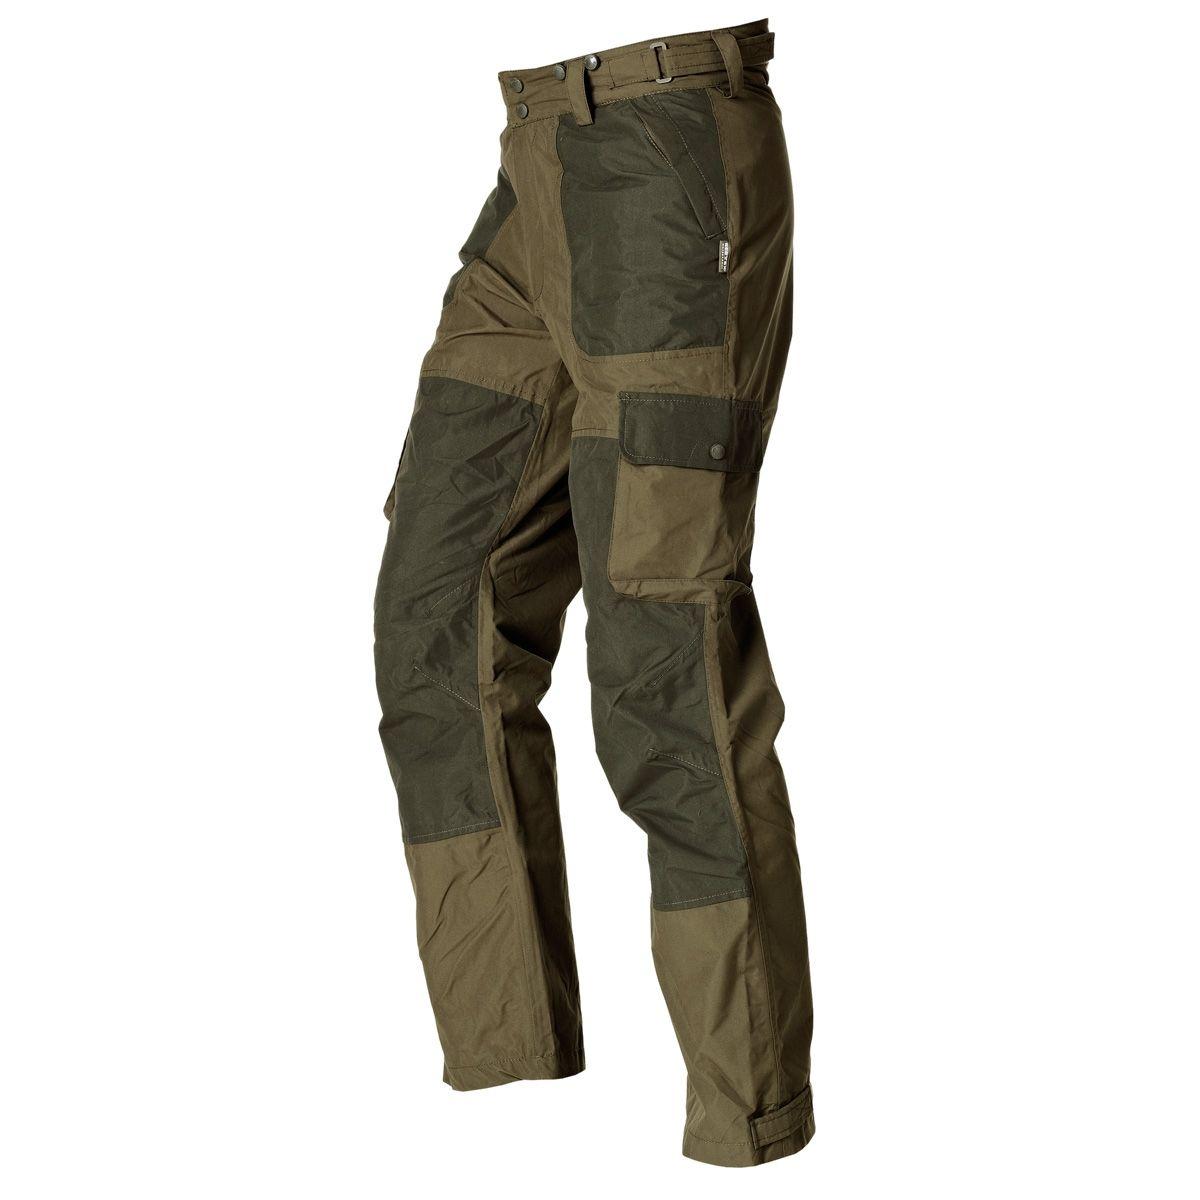 Seeland Lingfield Trousers - Green